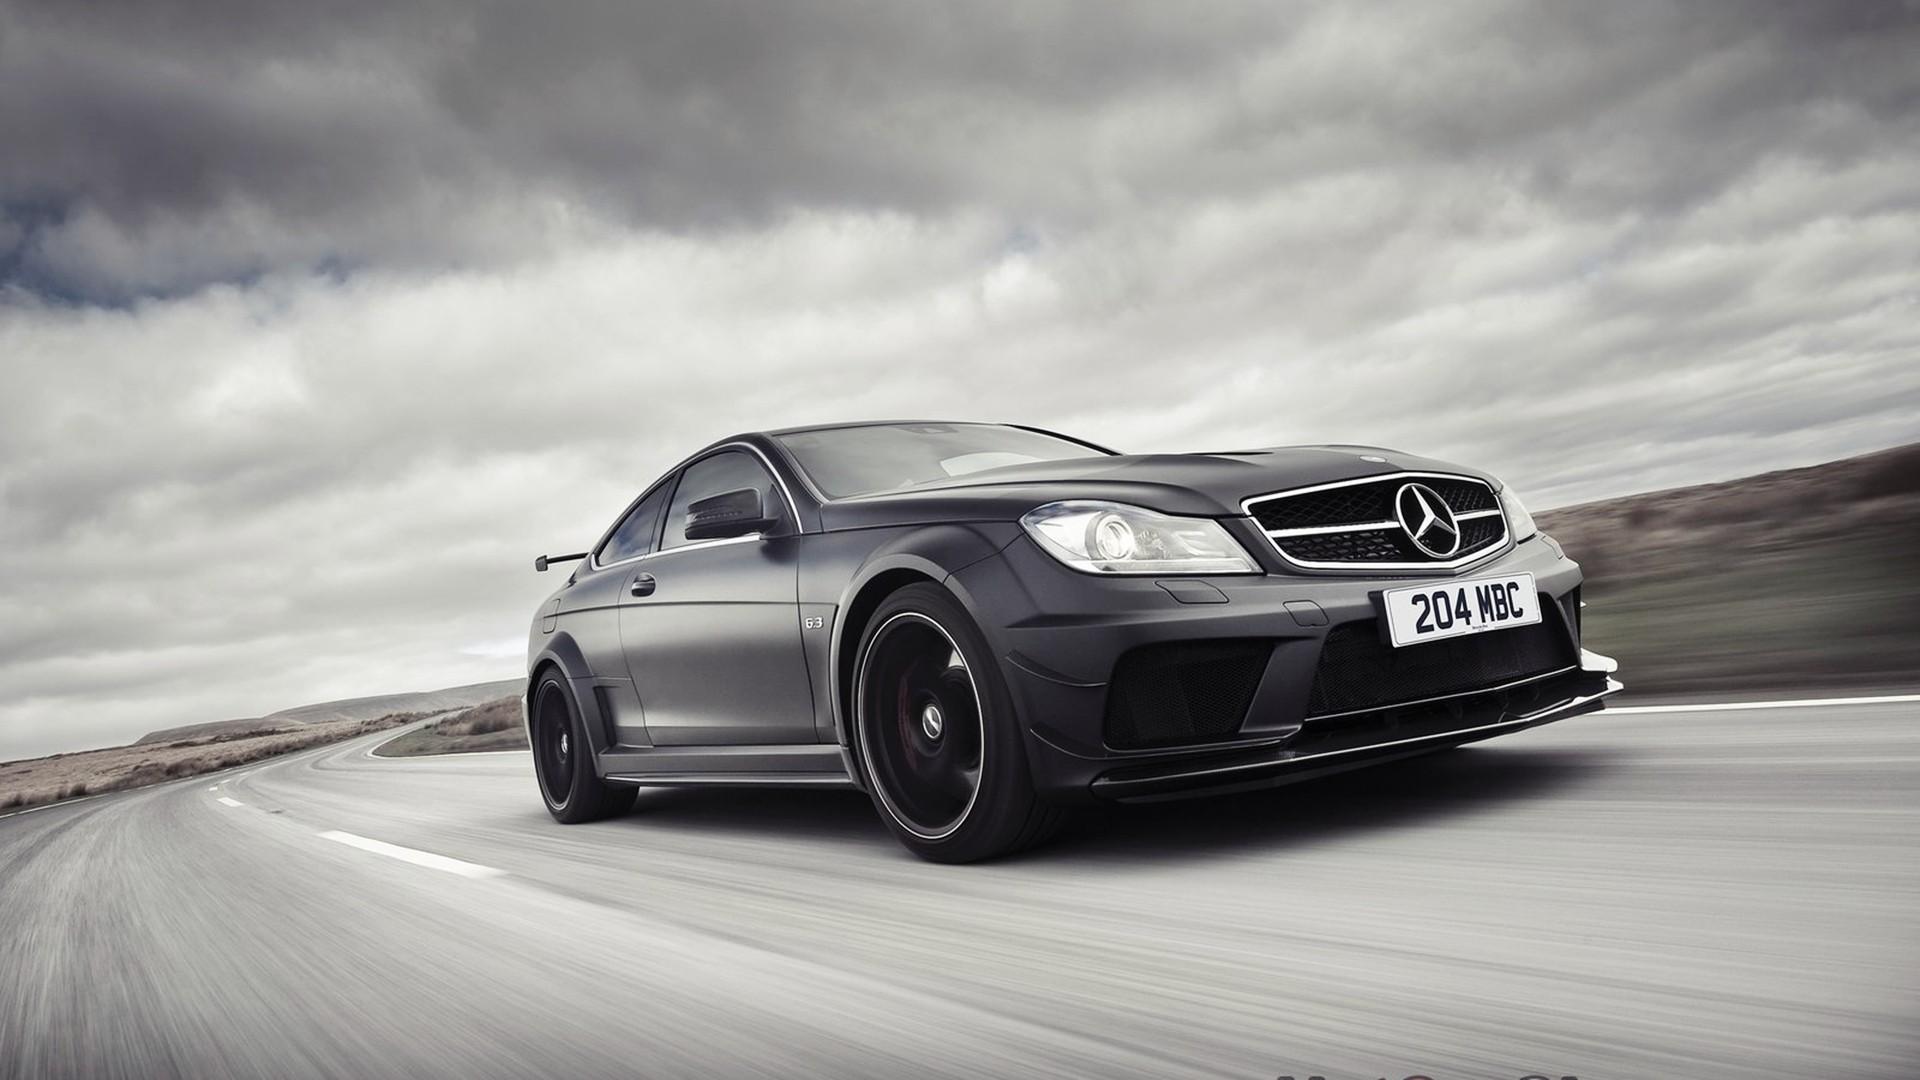 Images For Cars Wallpaper Black Cars Roads Automotive Royal Respect Mercedes Benz